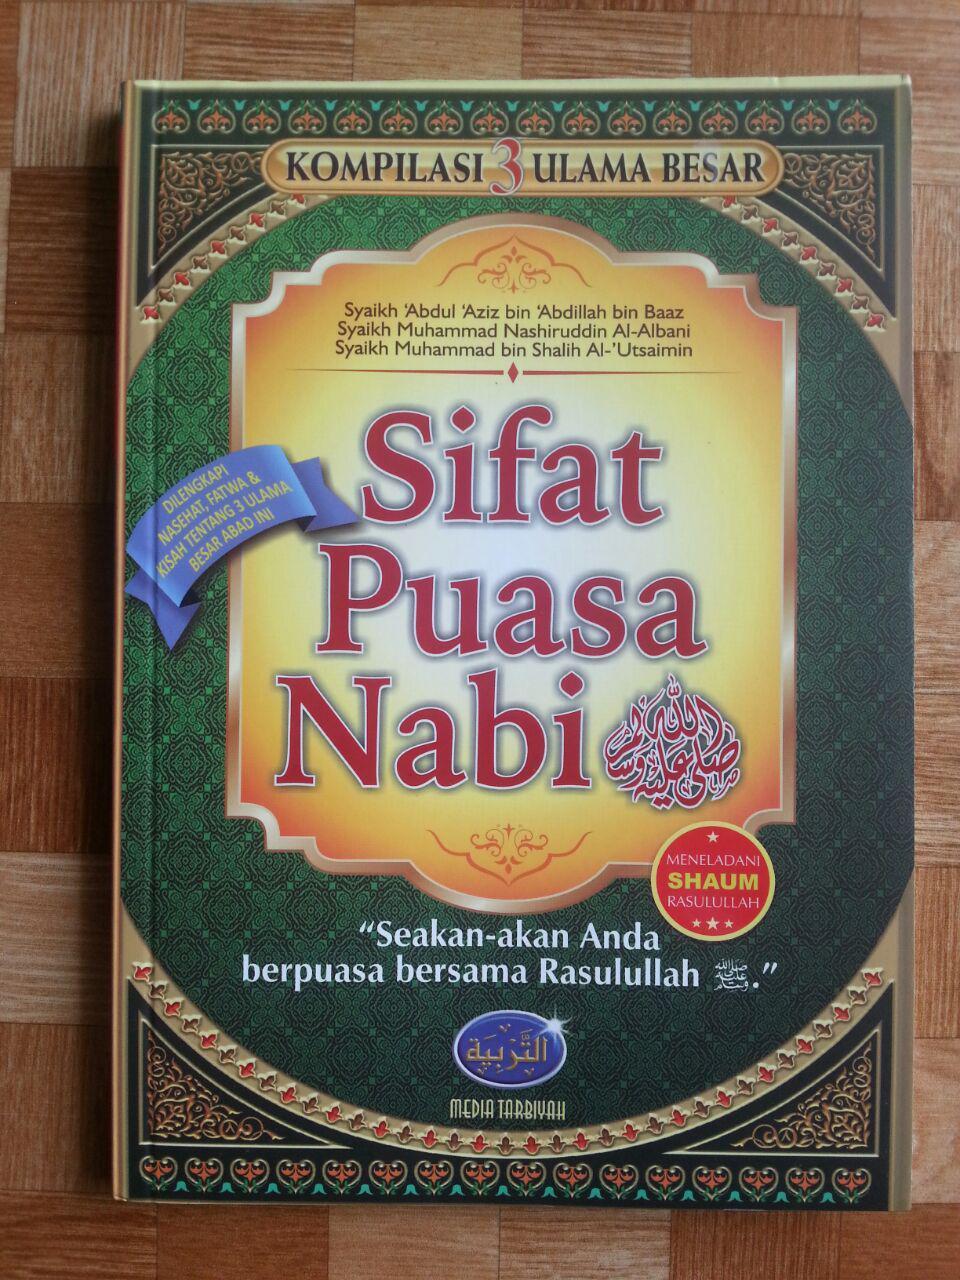 Buku Sifat Puasa Nabi Kompilasi 3 Ulama cover 2